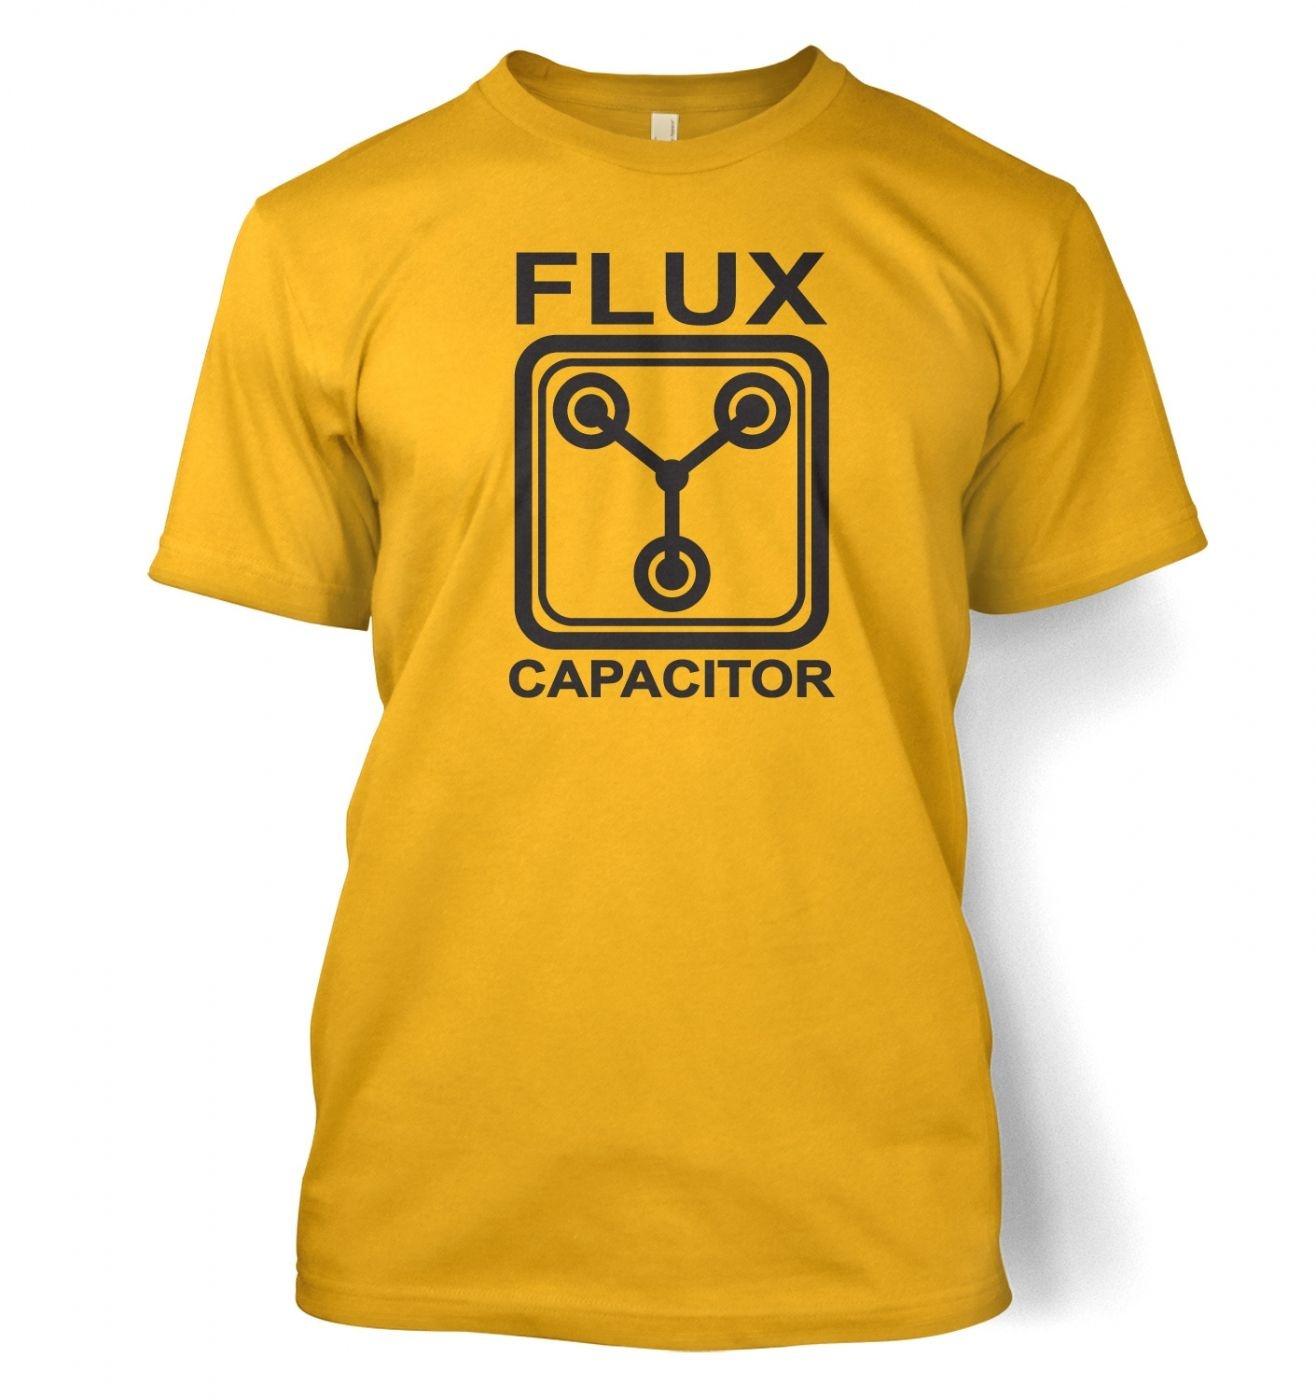 Flux Capacitor men's t-shirt